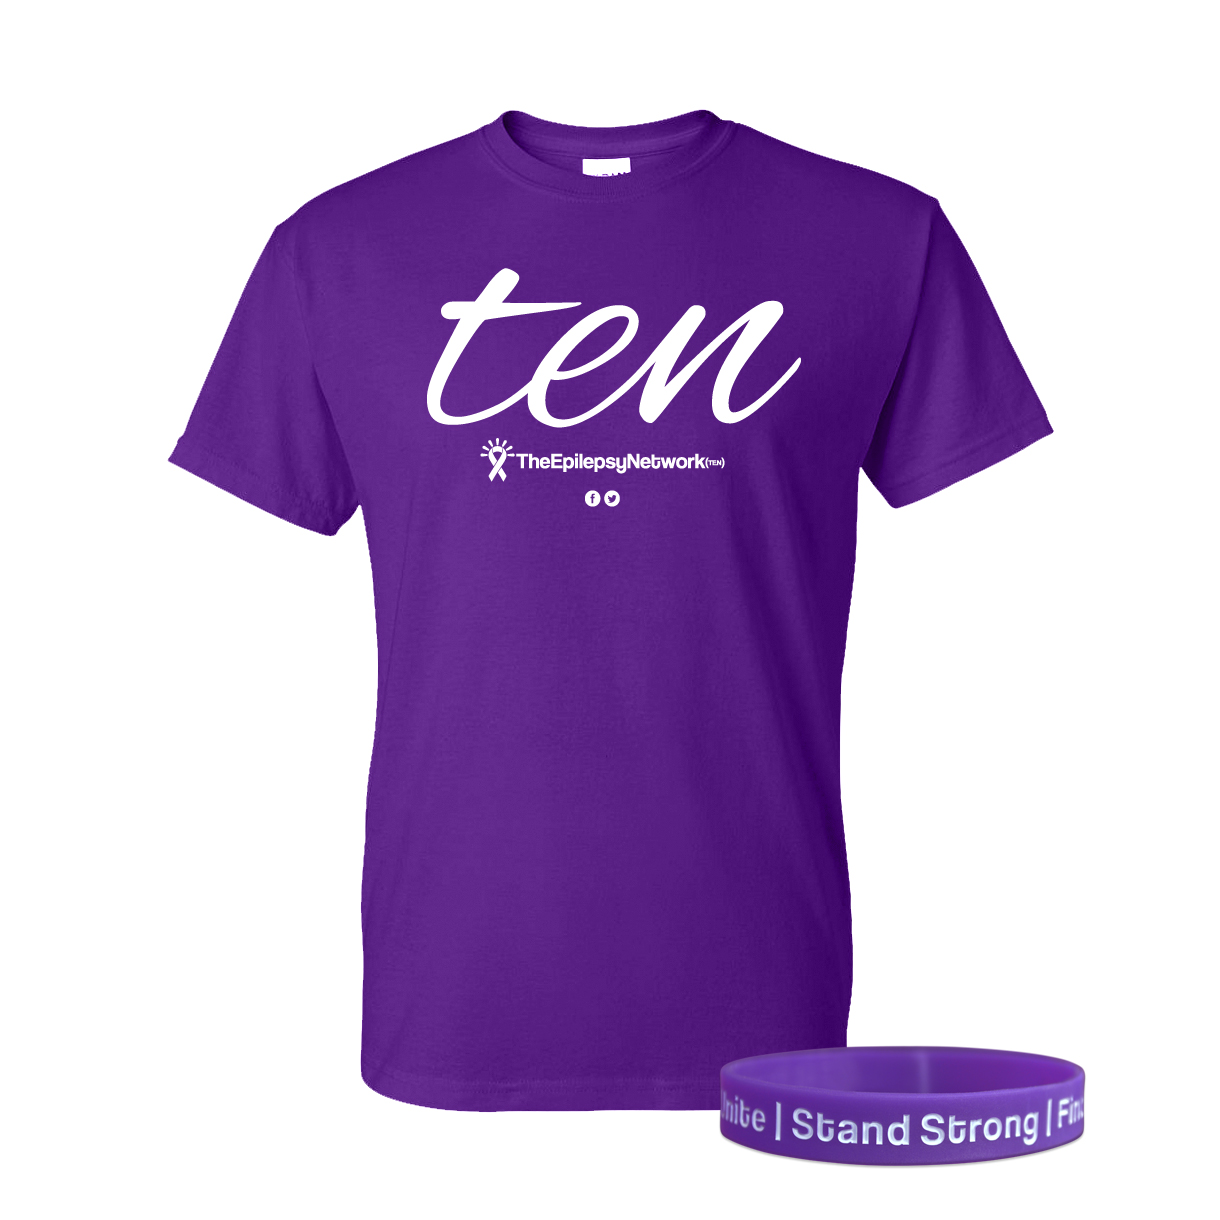 ten_t-shirt_productimage1_original